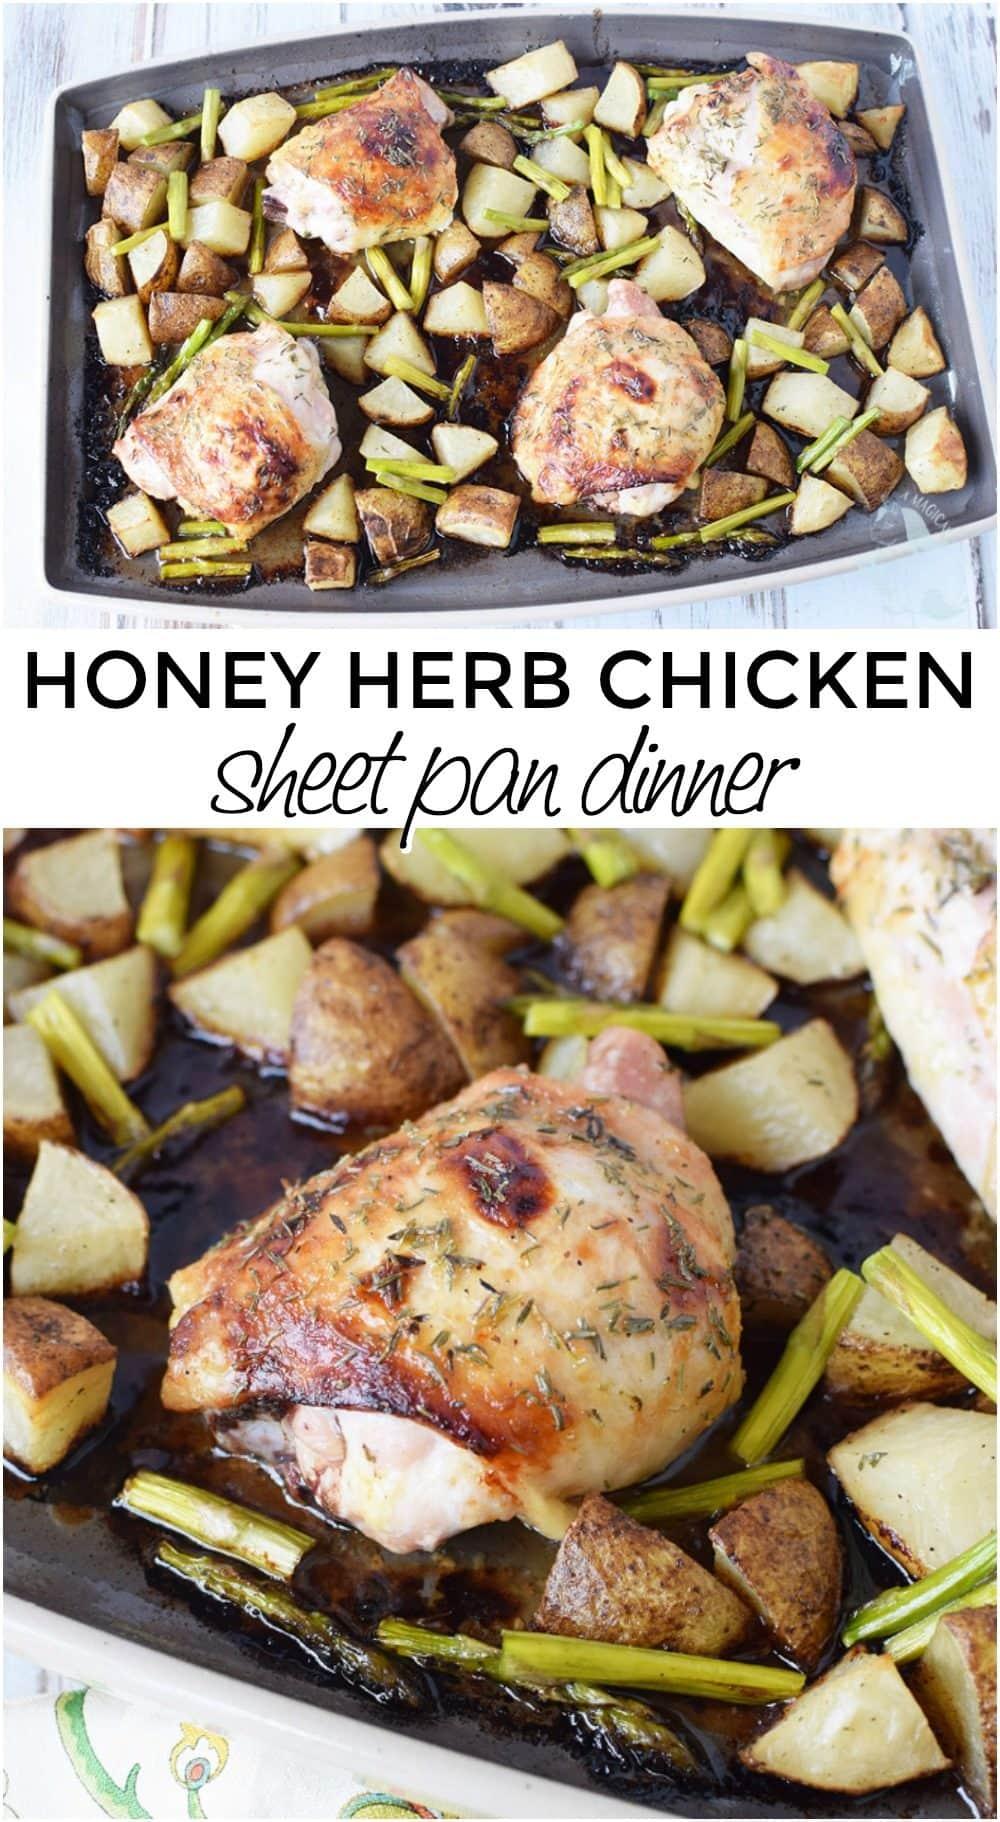 Honey Herb Baked Chicken Thighs Sheet Pan Dinner